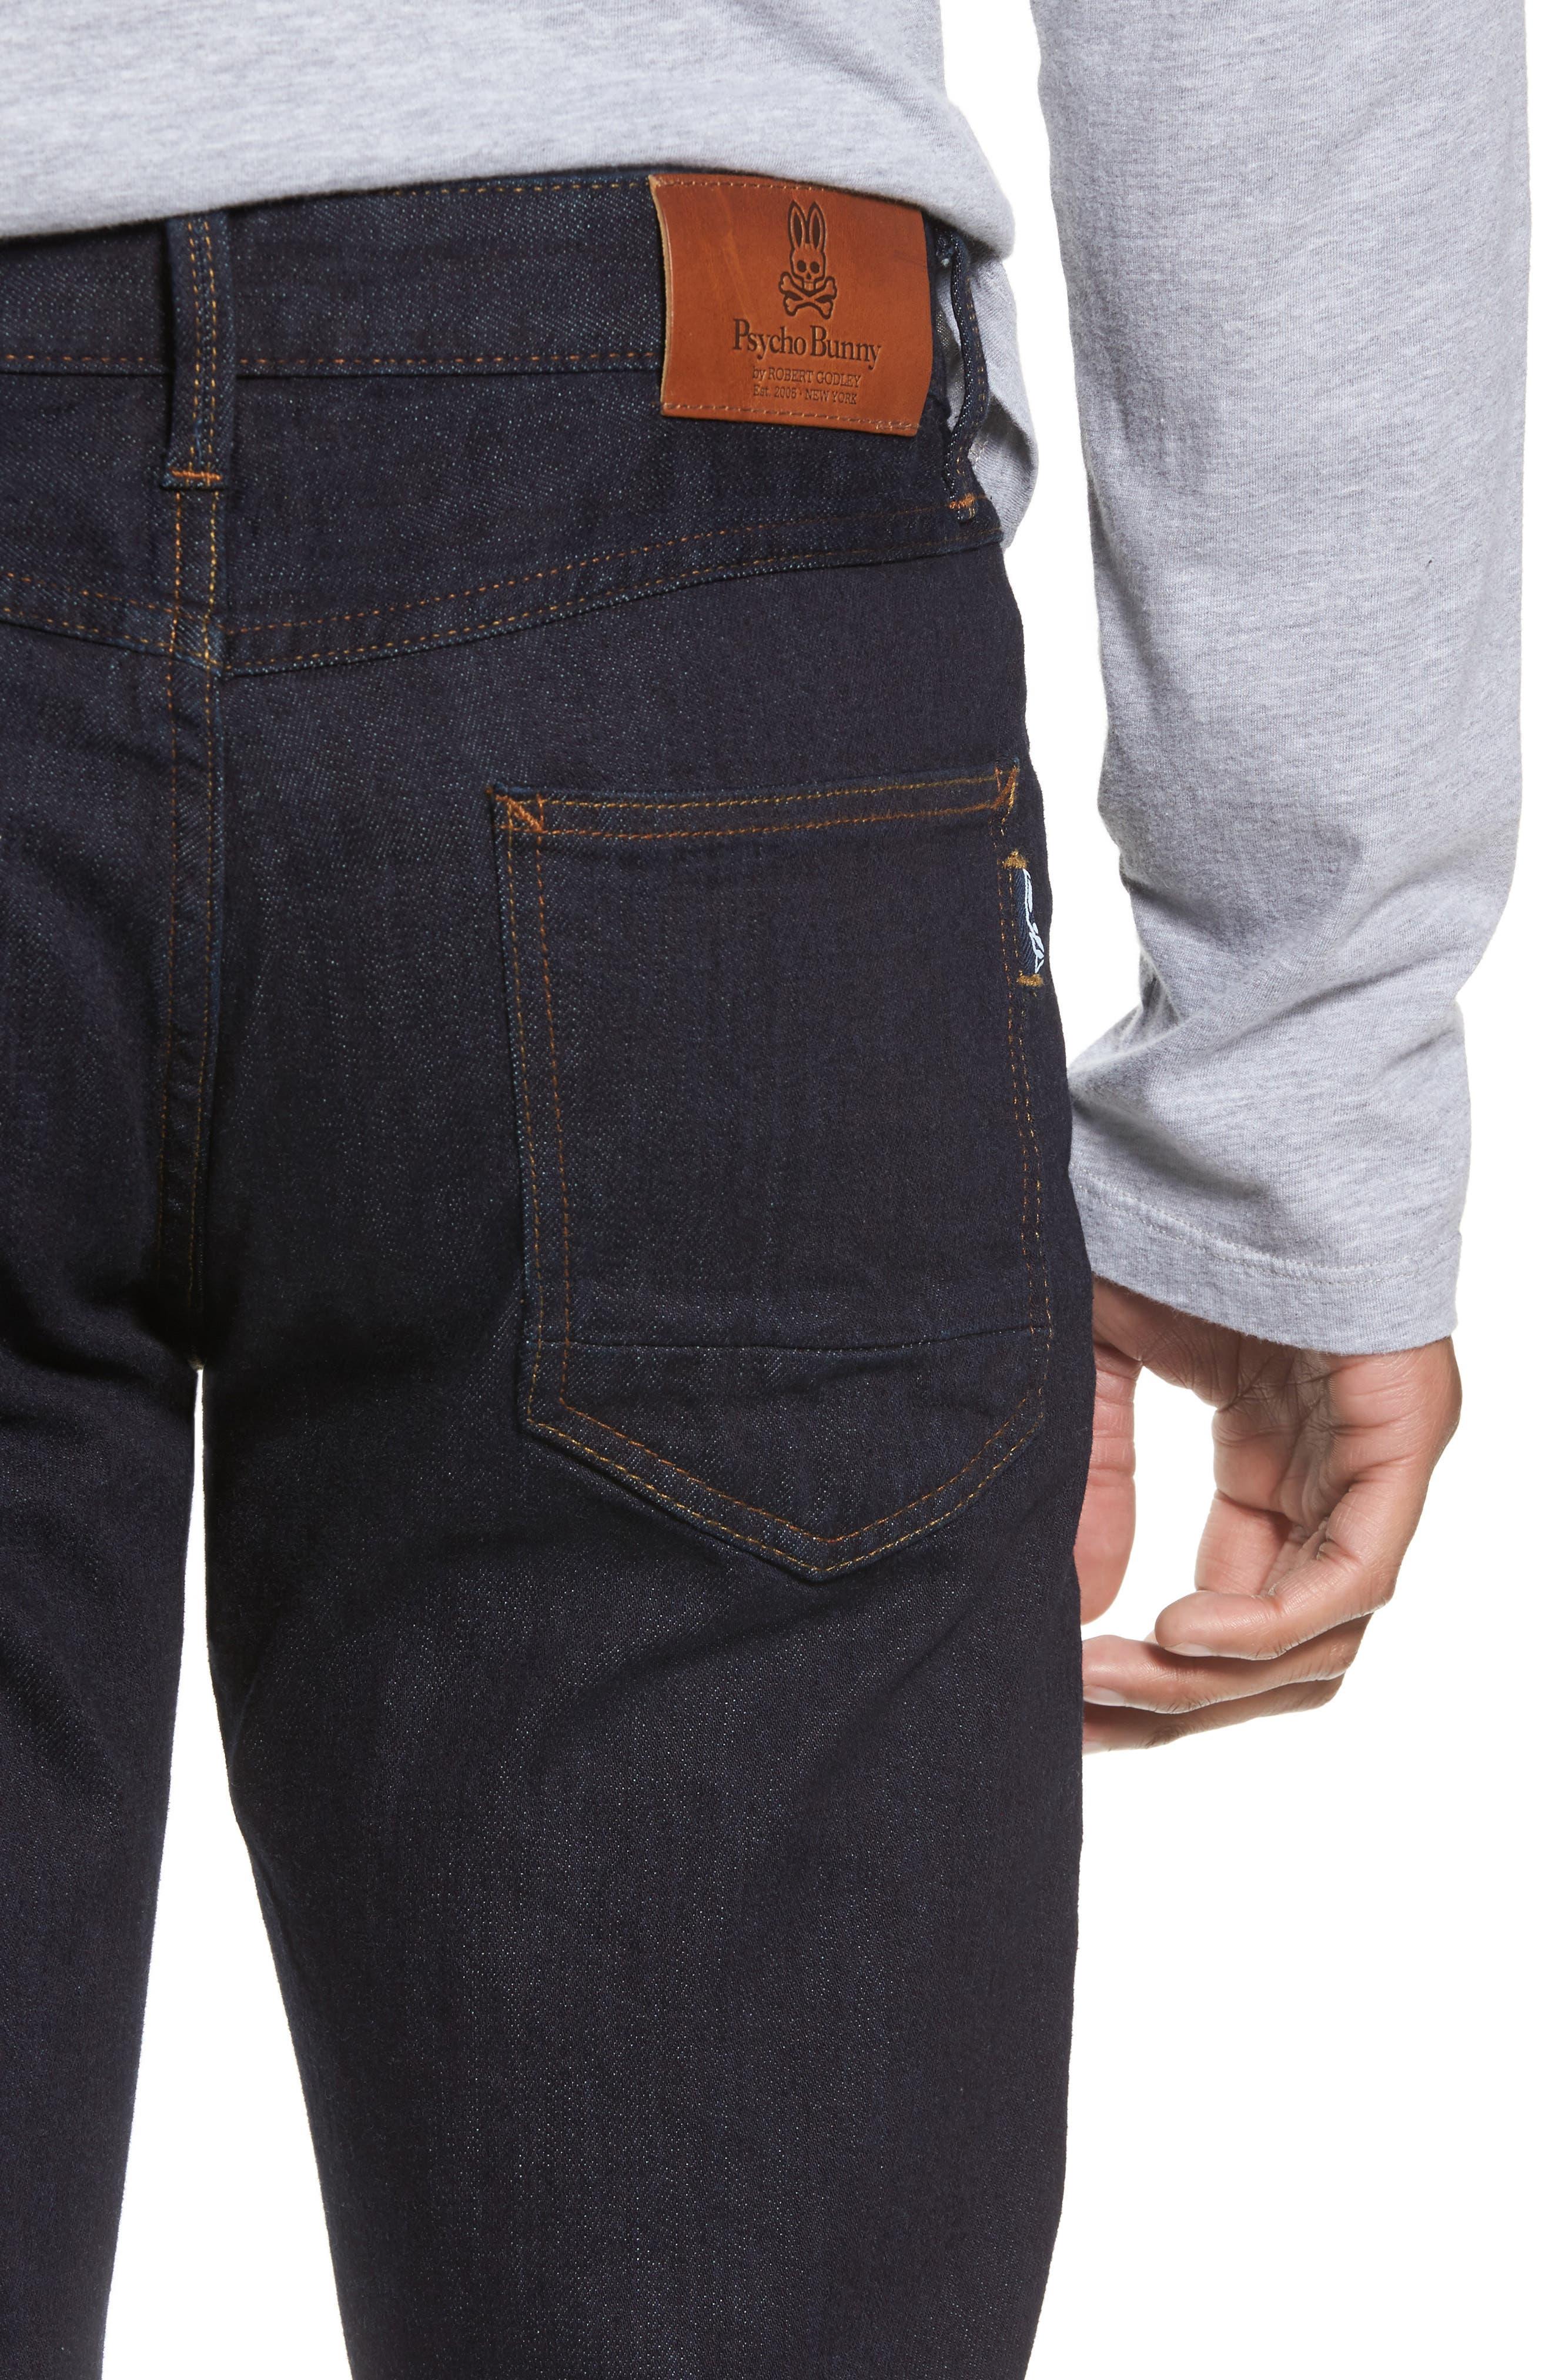 Canal Slim Fit Jeans,                             Alternate thumbnail 4, color,                             460